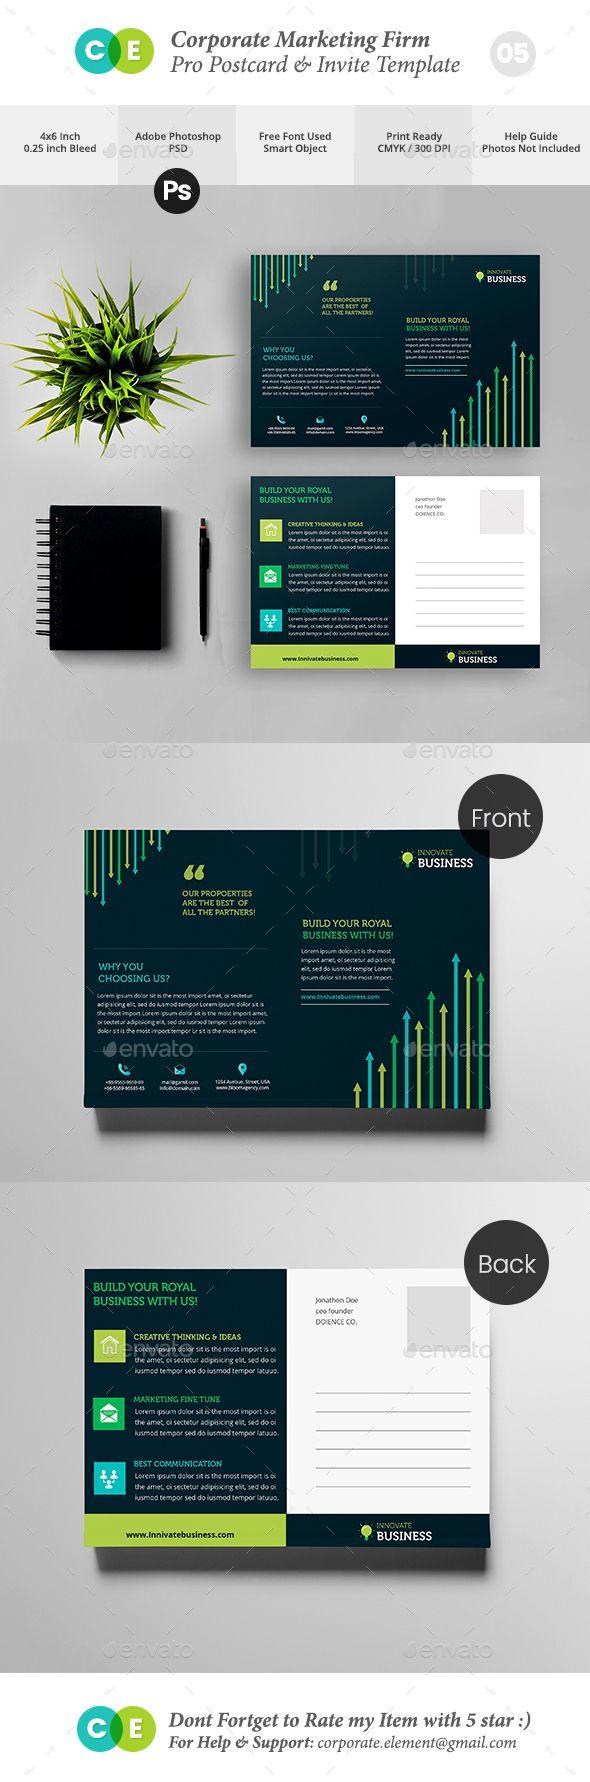 #Corporate Marketing Firm Pro Postcard Invite  V05 - #Cards & #Invites Print Templates Download here:  https://graphicriver.net/item/corporate-marketing-firm-pro-postcard-invite-v05/20321614?ref=alena994